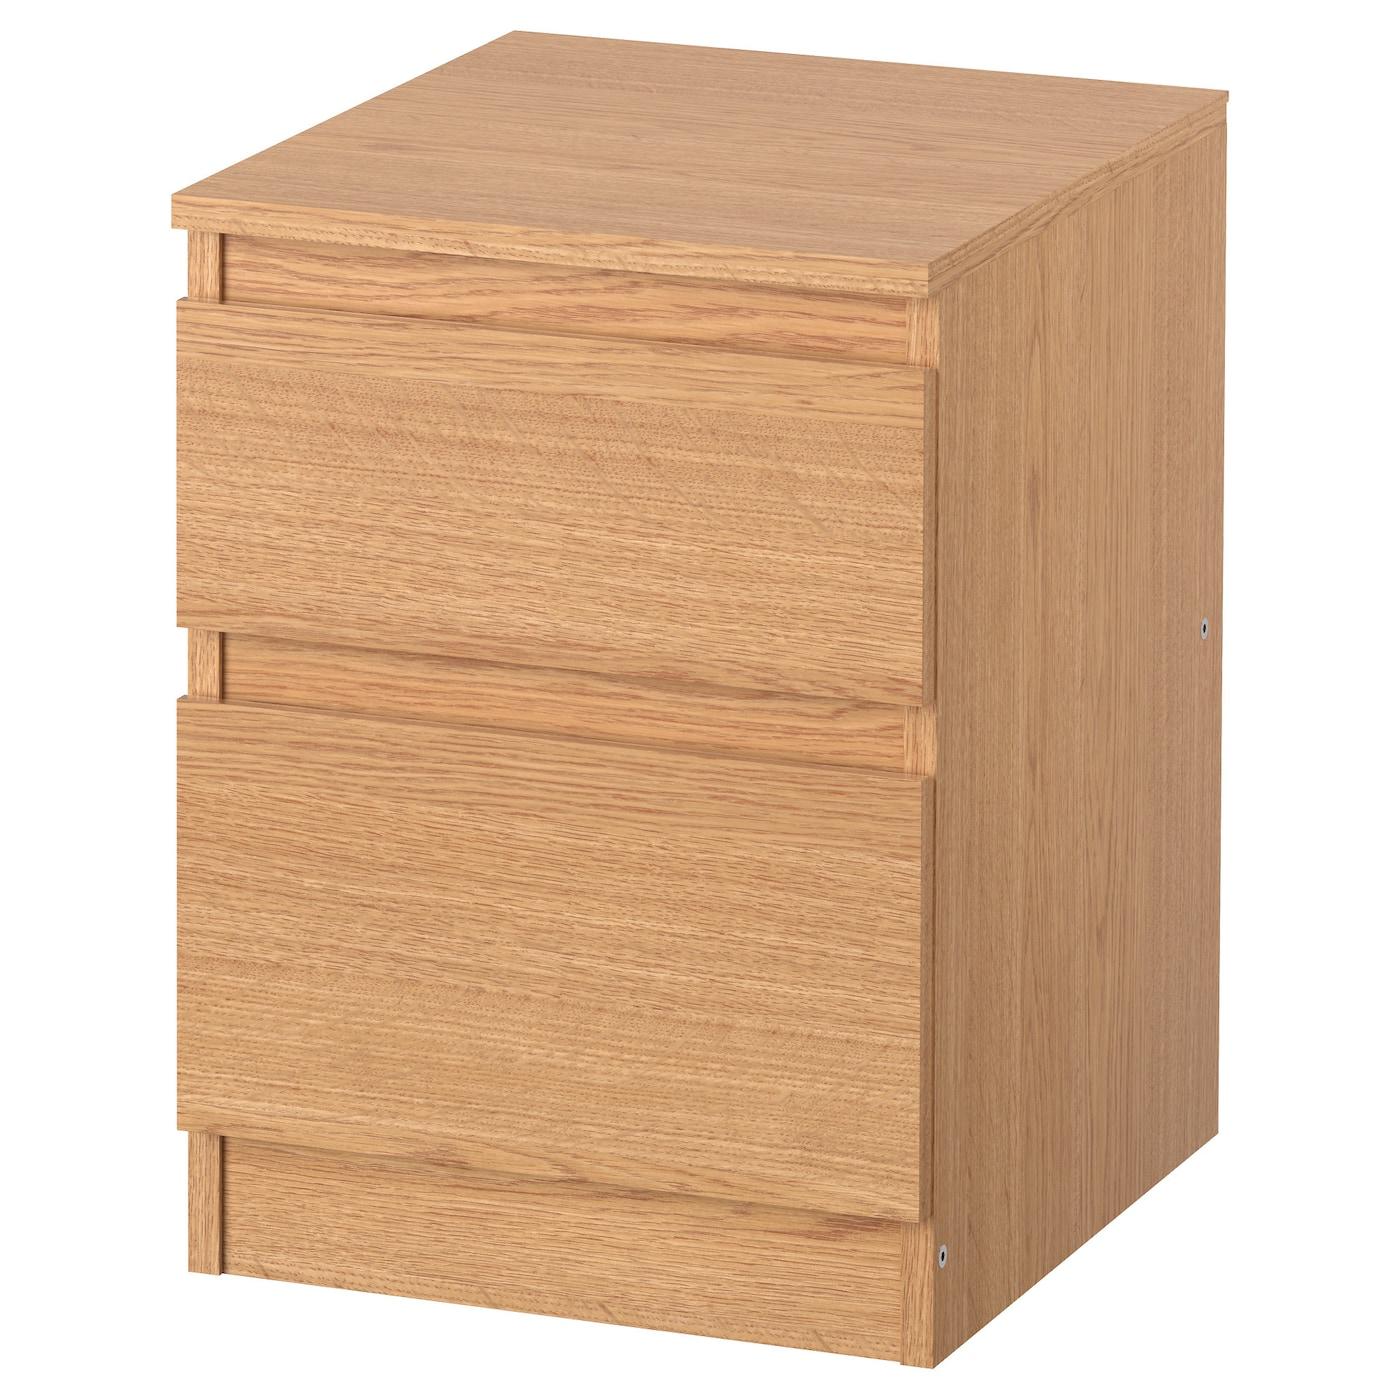 Ikea Rast Kommode chest of drawers dressers ikea dublin